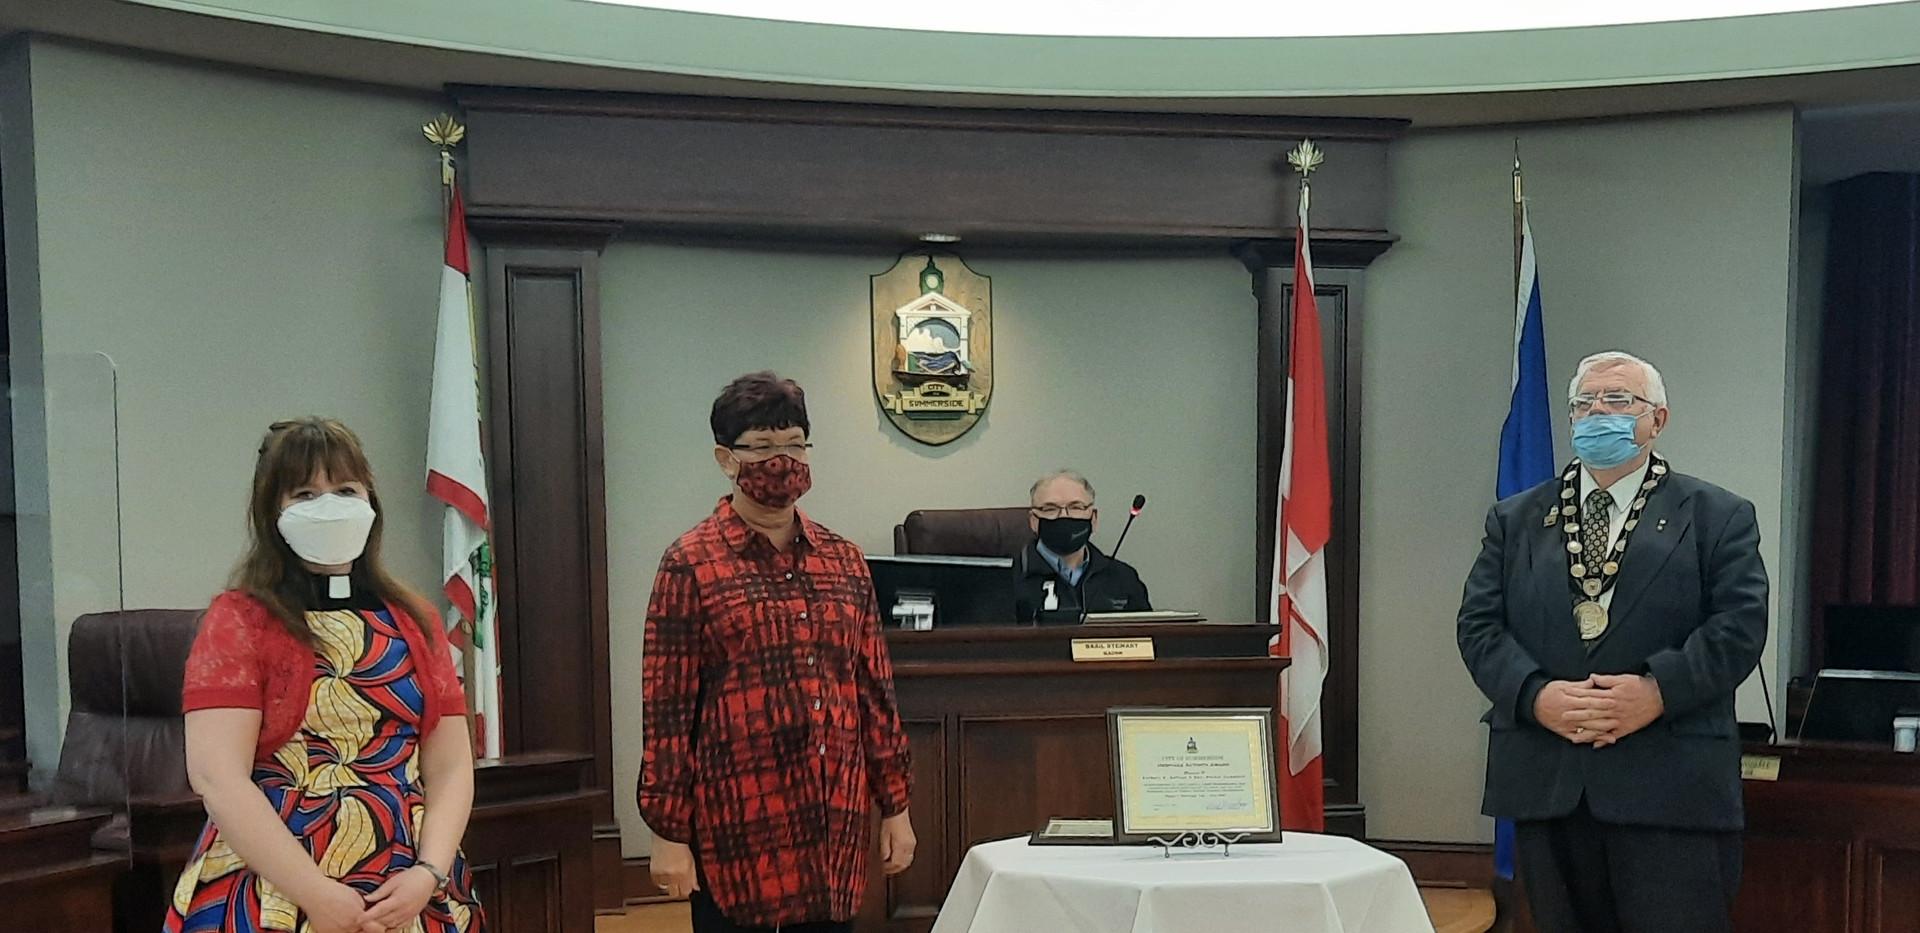 Barbara A. Gallant and Rev. Rachel Campbell - Heritage Activity Award